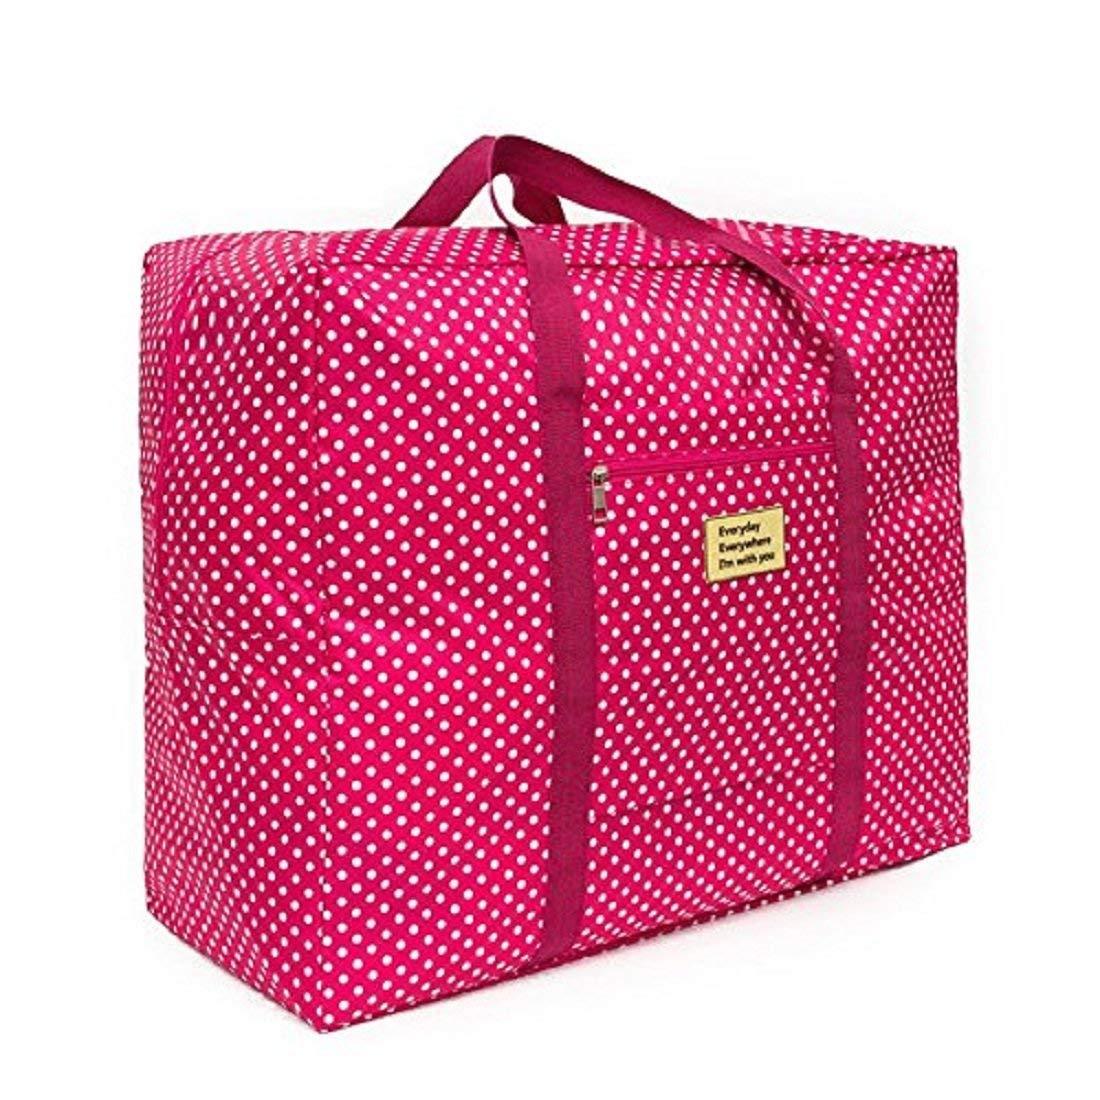 Travel Luggage Duffle Bag Lightweight Portable Handbag Pies Pattern Large Capacity Waterproof Foldable Storage Tote